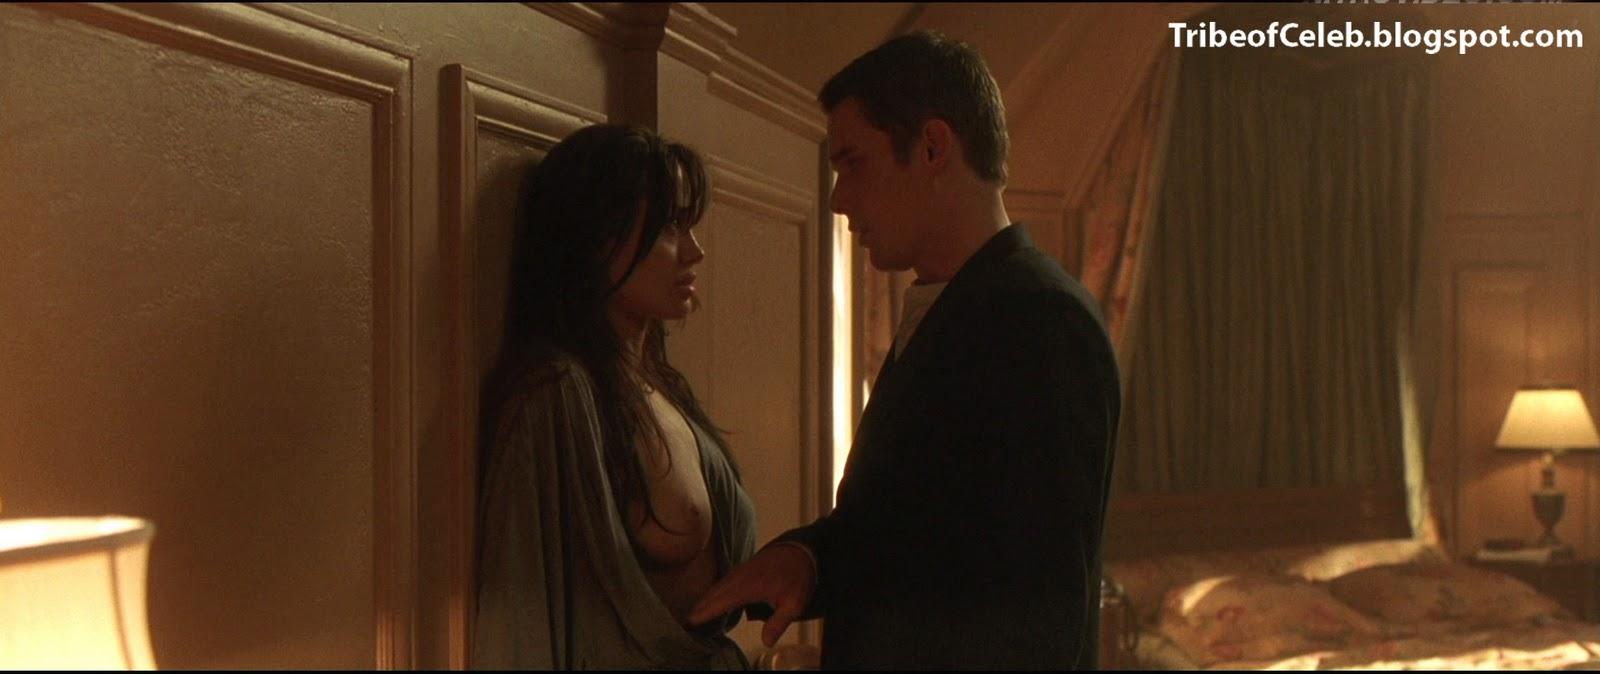 Here against Angelina jolie sex scene taking lives that